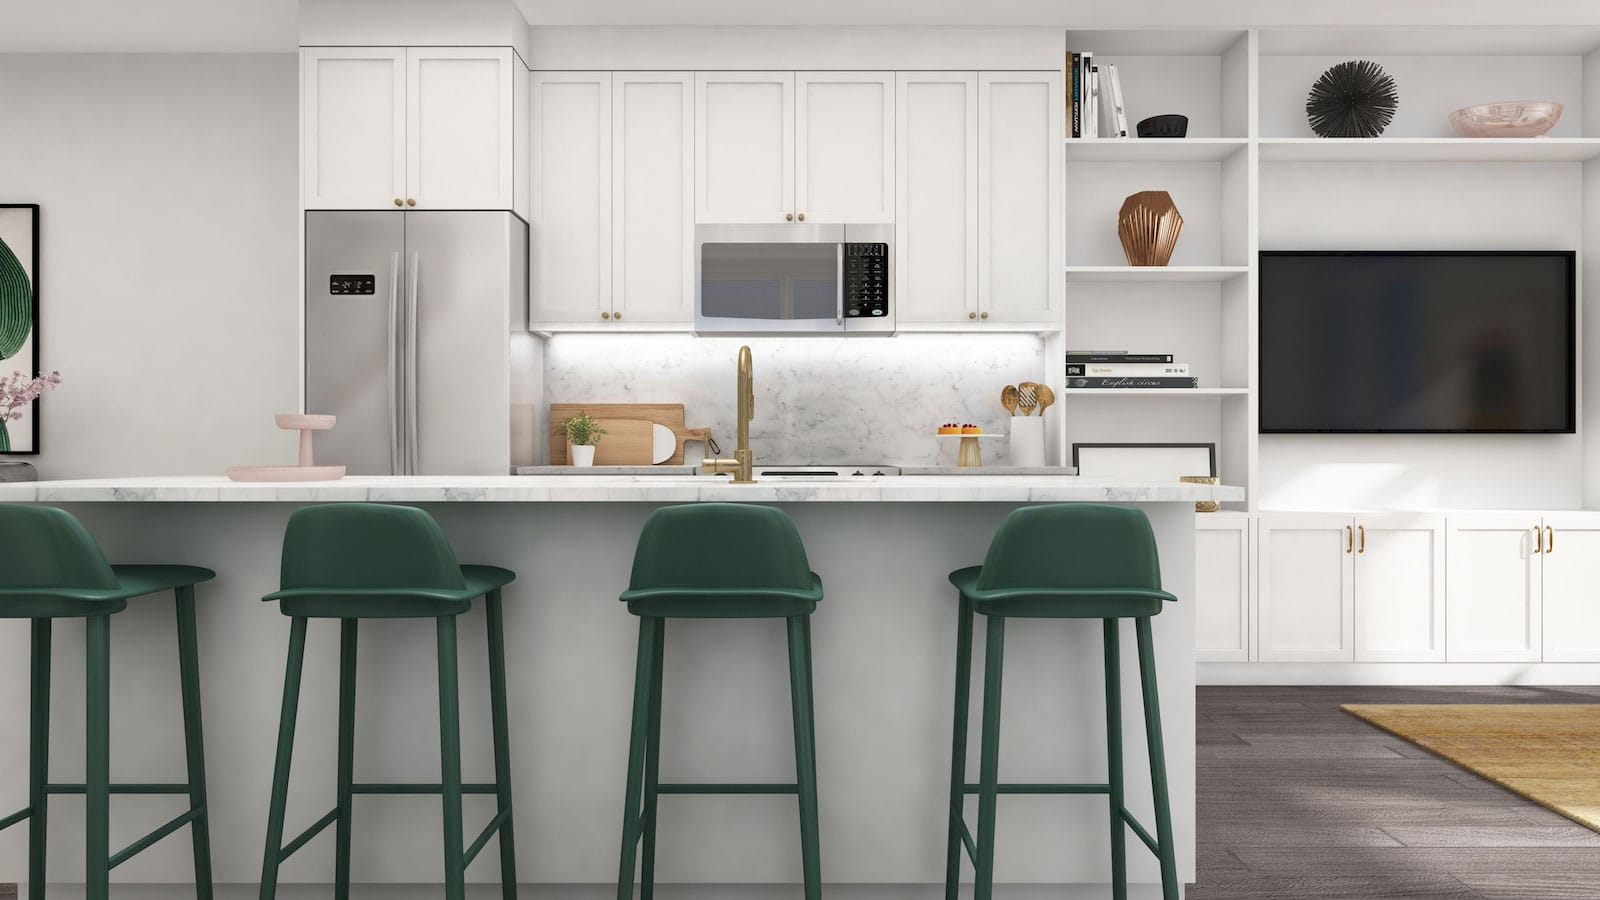 NuTowns Interior Rendering of Kitchen Area